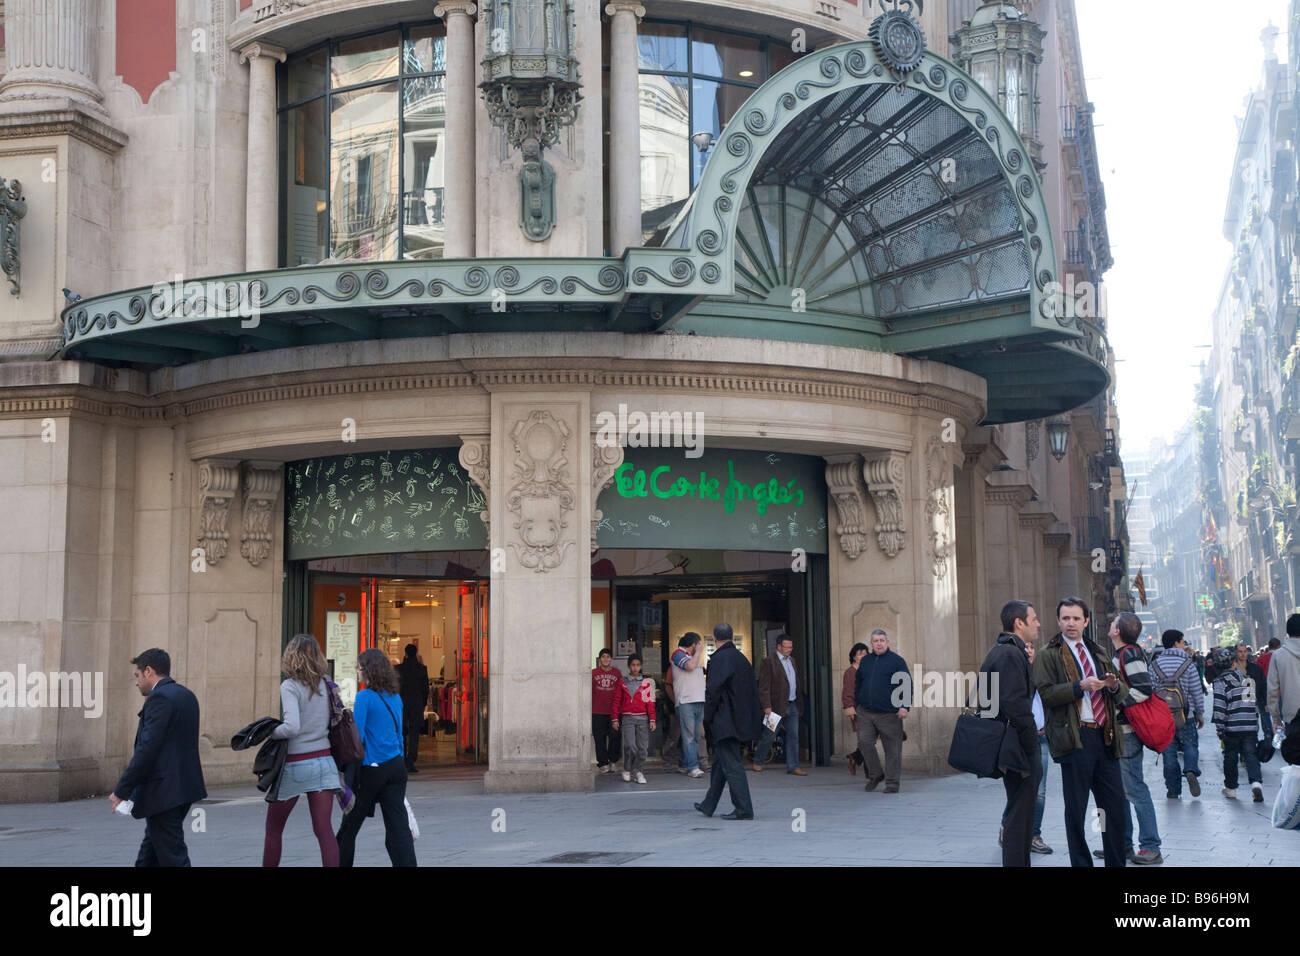 El corte ingles department store shopping barcelona stock photo royalty free image 22887584 - El corte ingles stores ...